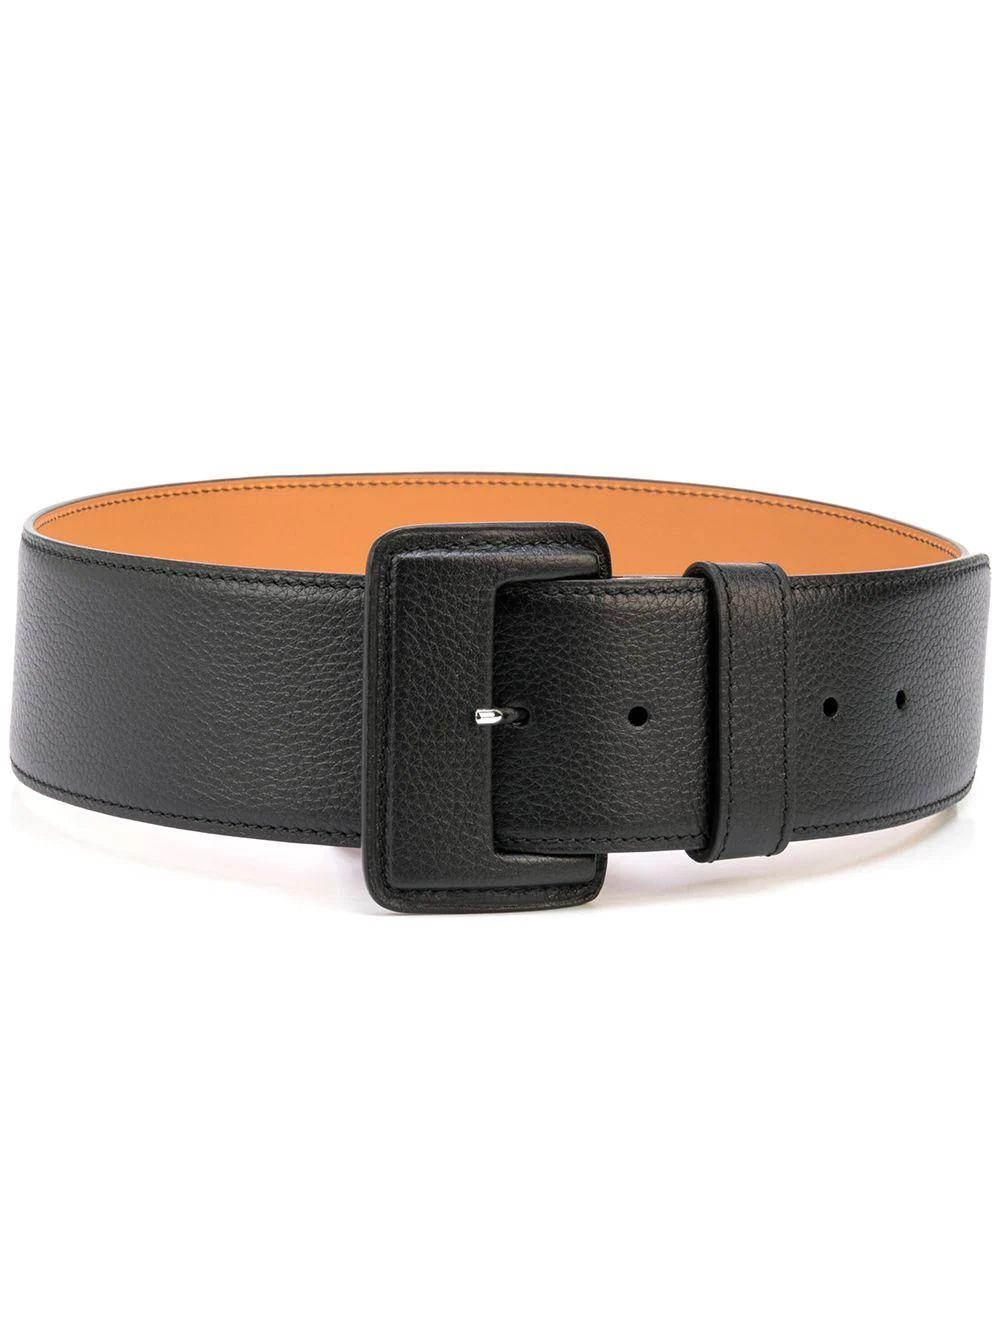 La Merveilleuse 60mm Belt Item # MV55